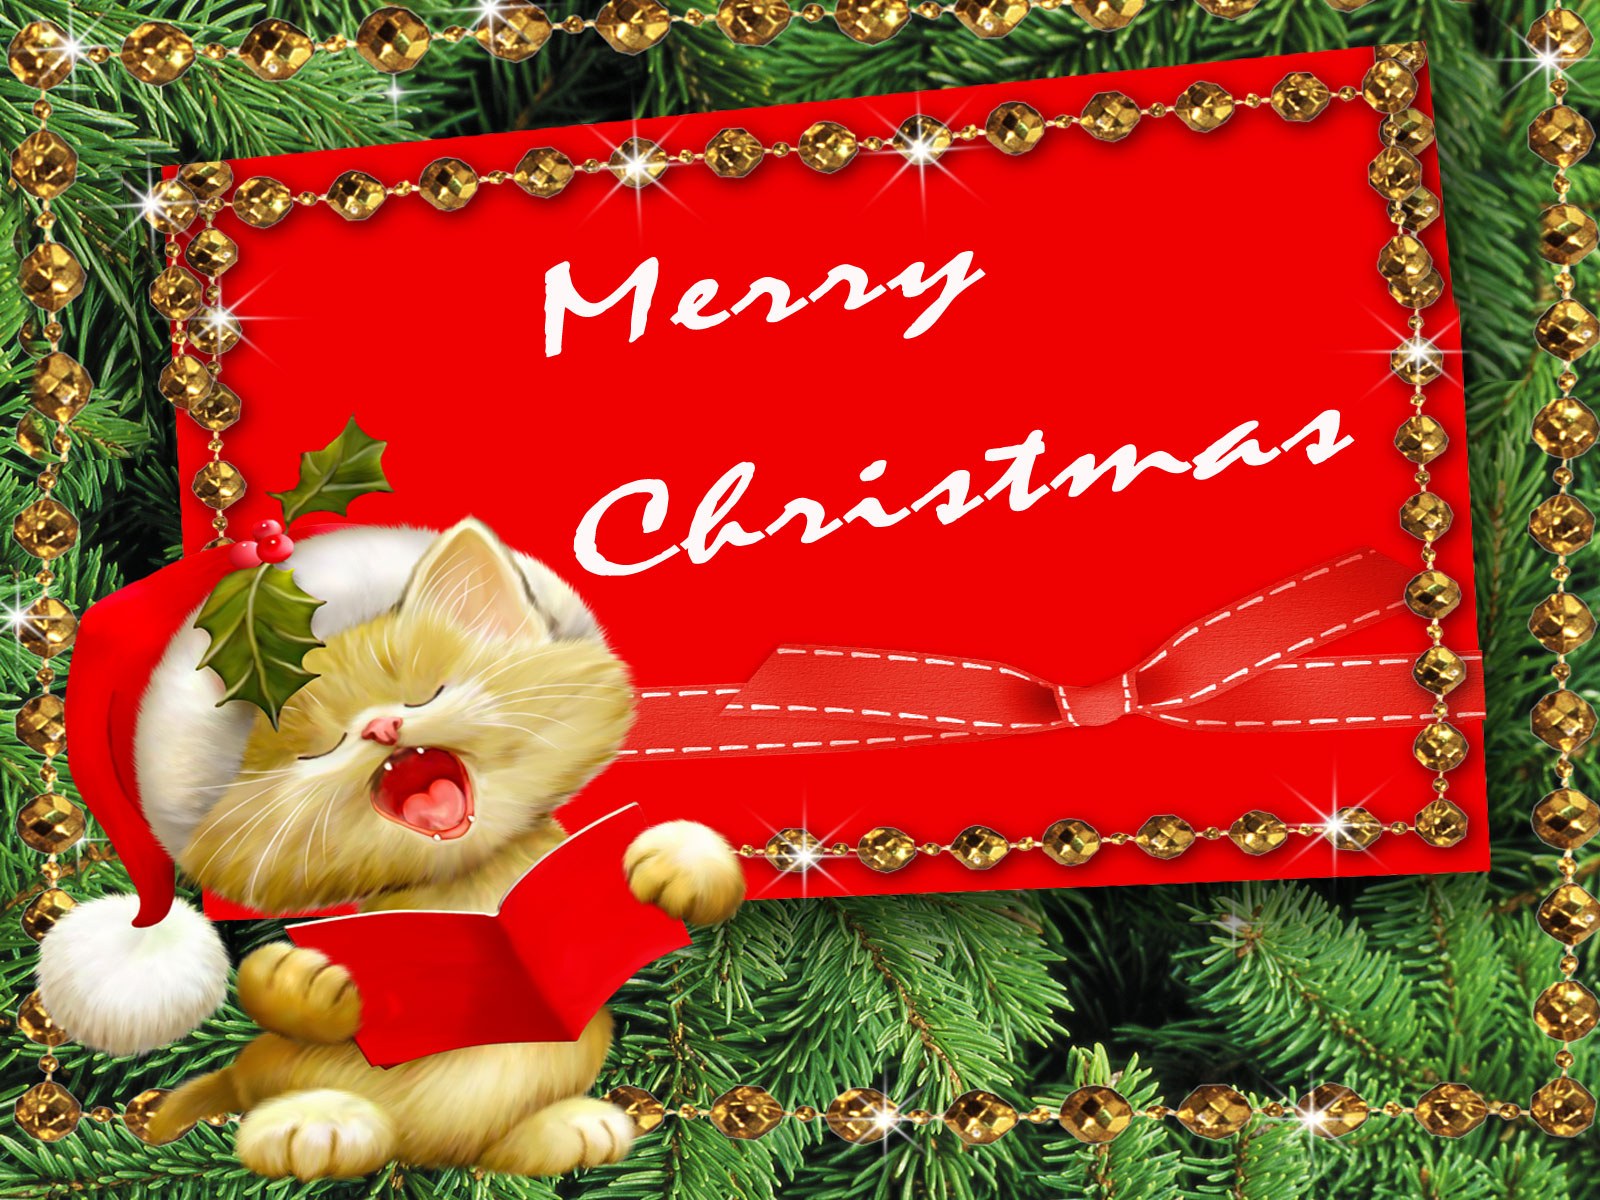 Christmas Desktop Backgrounds | Download Merry Christmas Wallpaper ...